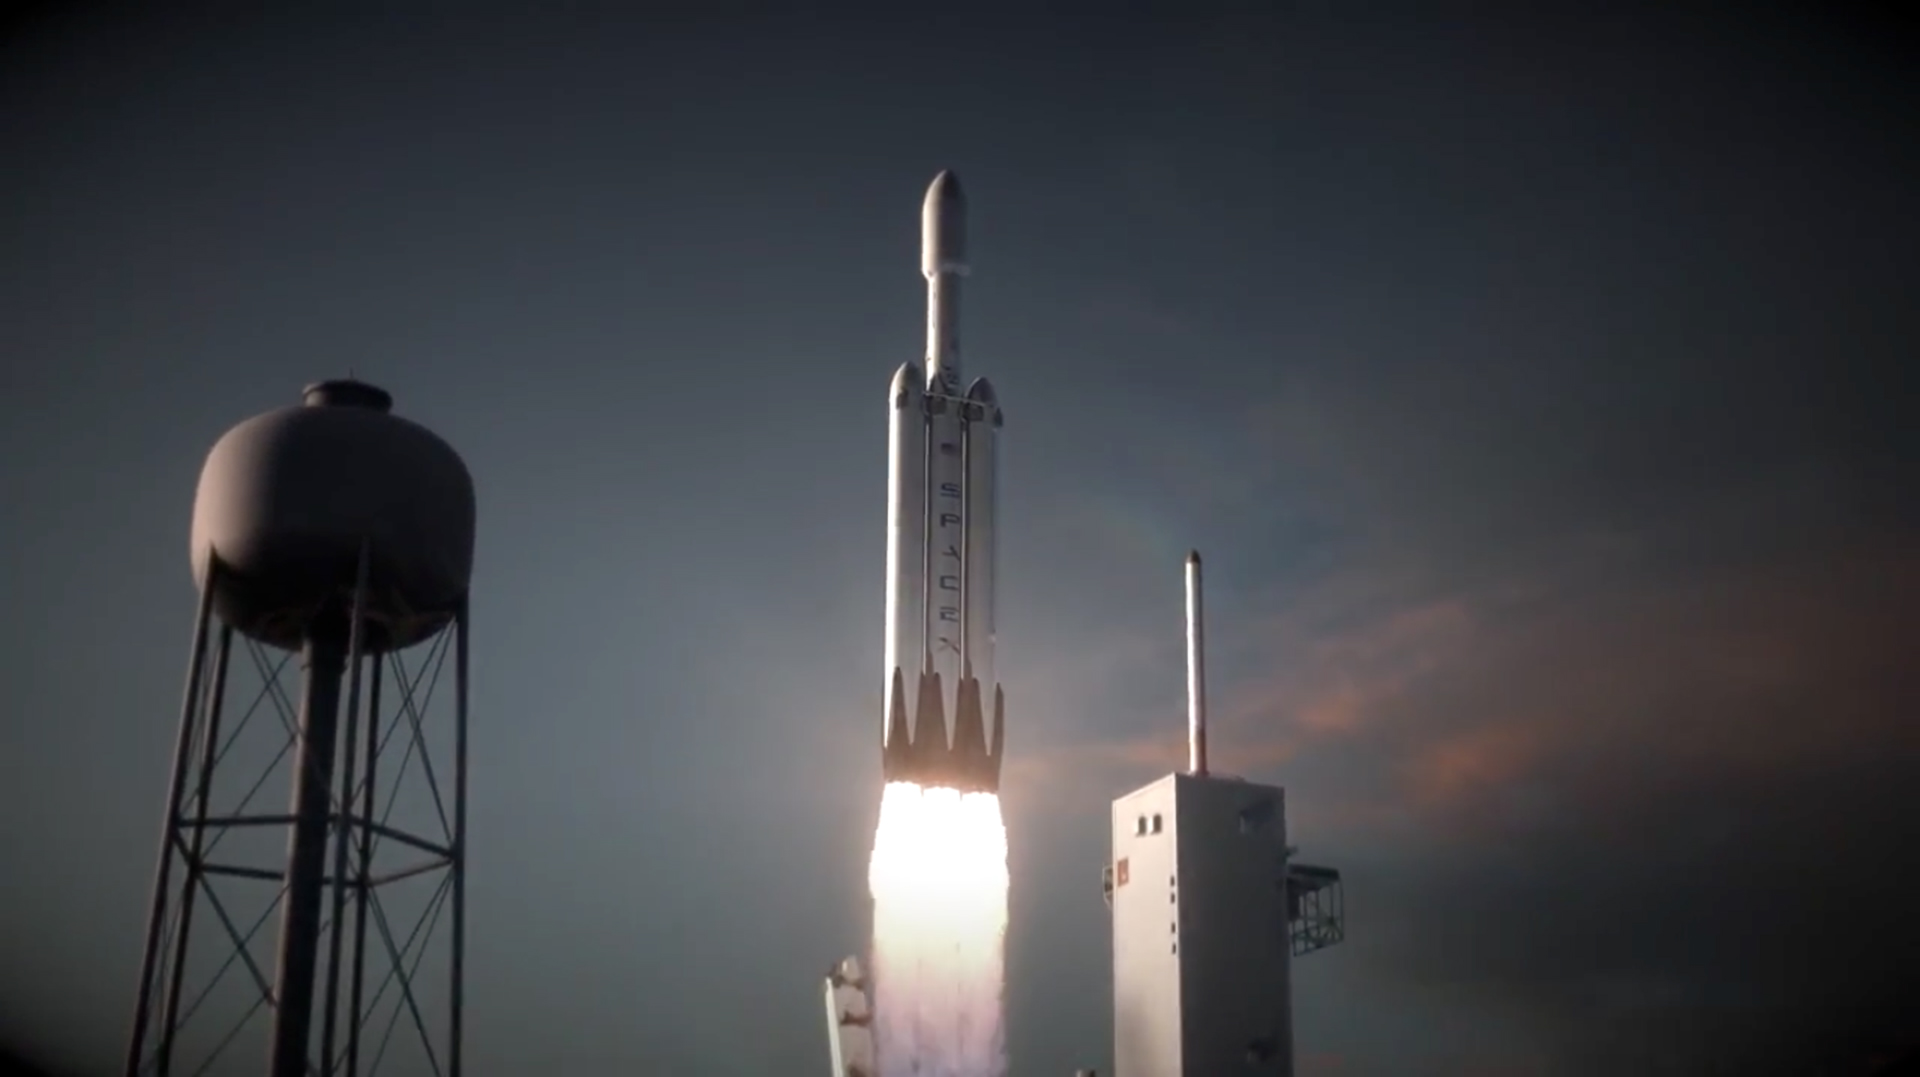 falcon heavy rocket concept - photo #29